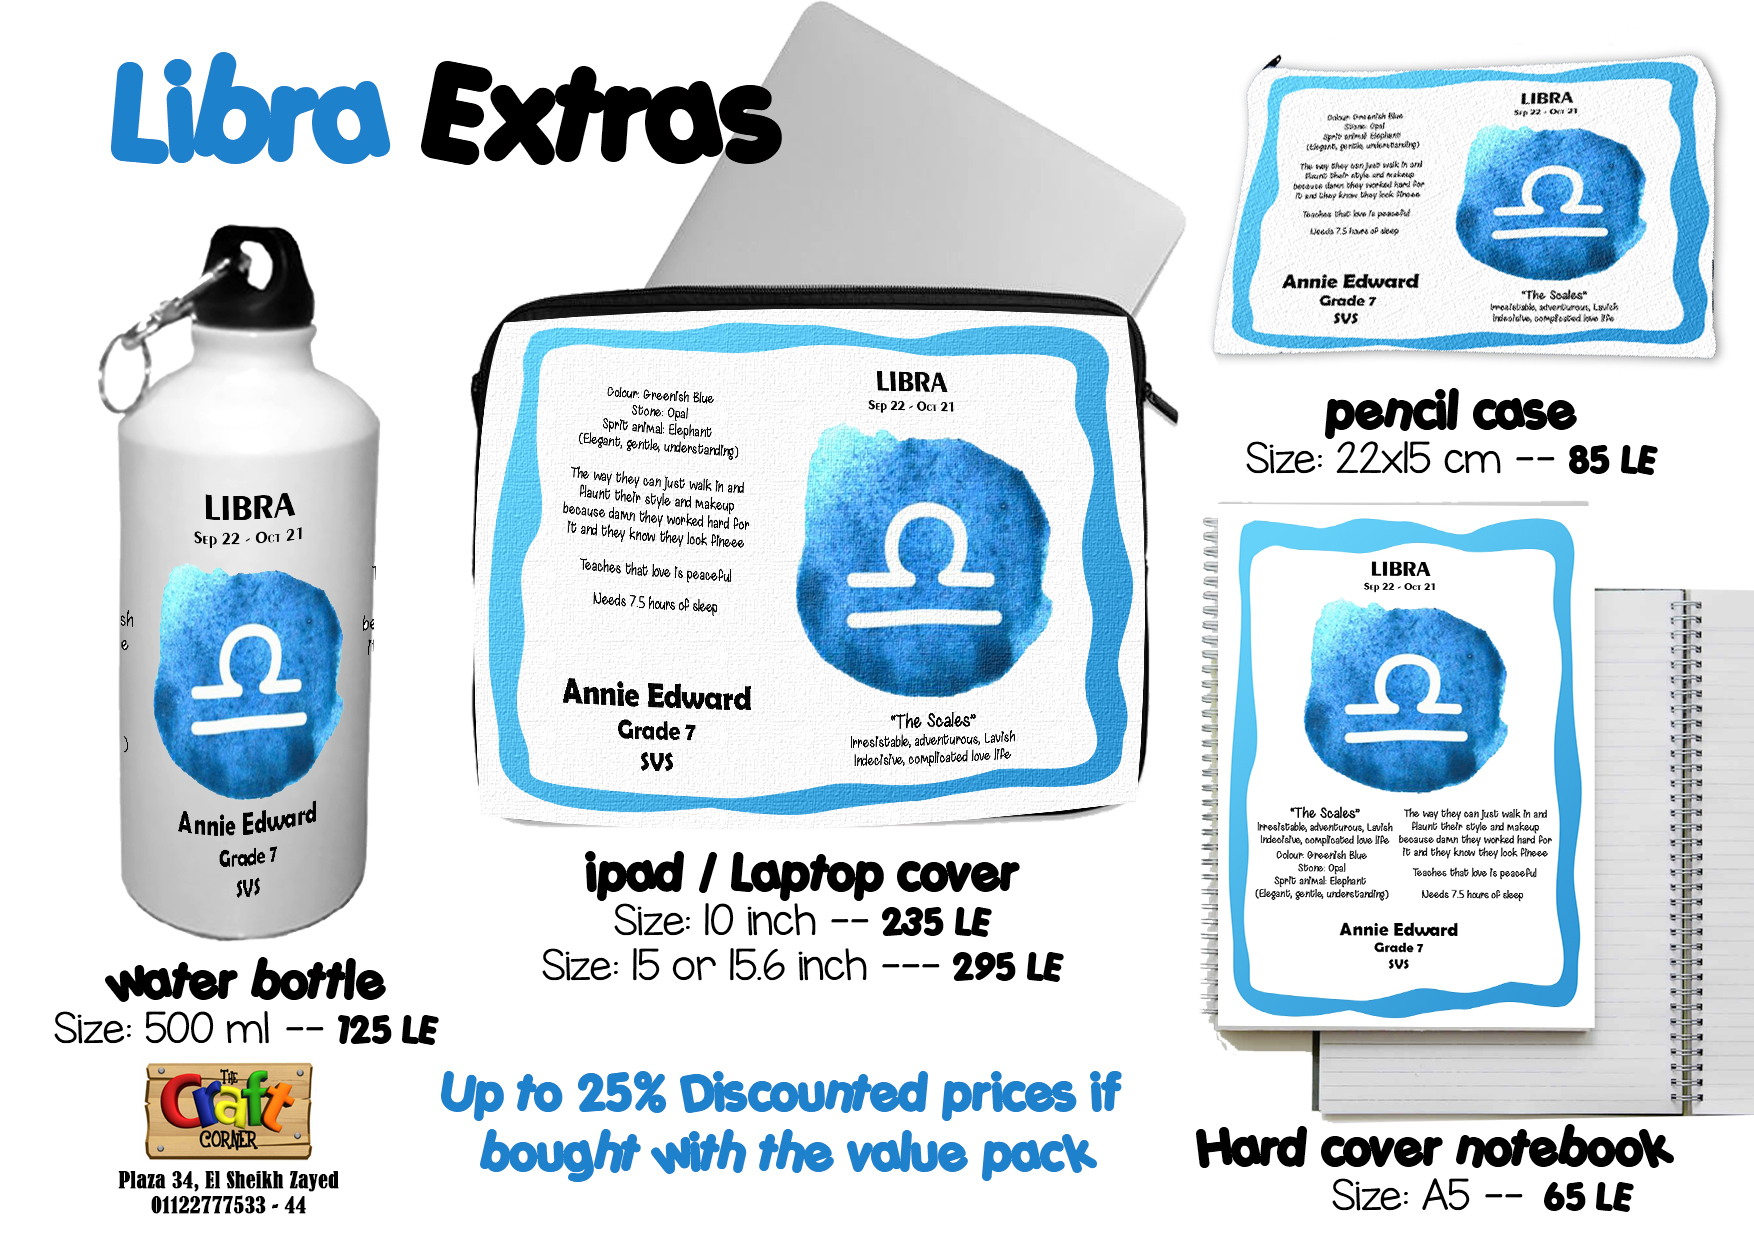 Libra Extras